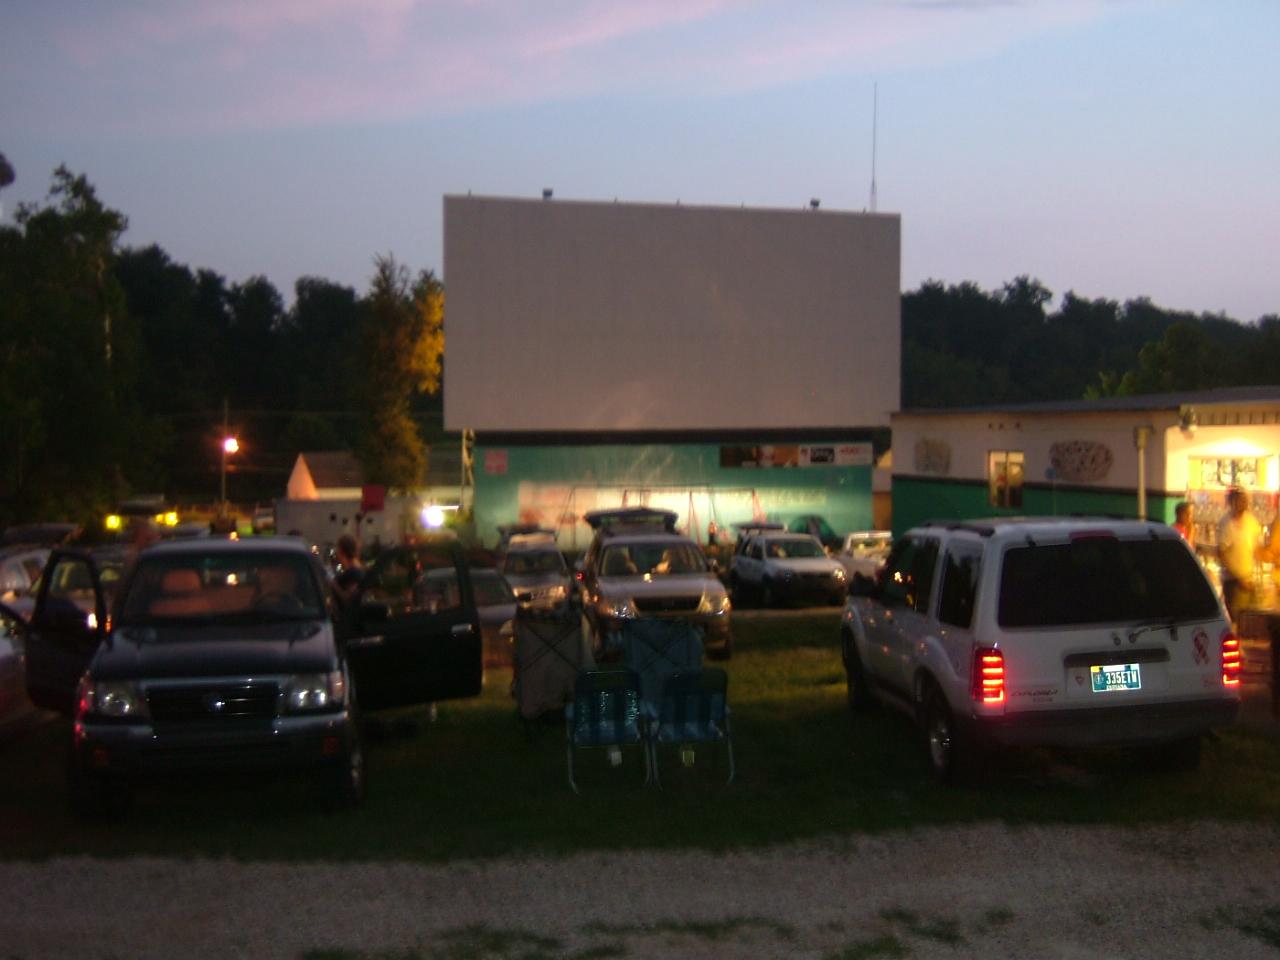 Peppermint twists georgetown in drive in movie theater for Georgetown movie theater